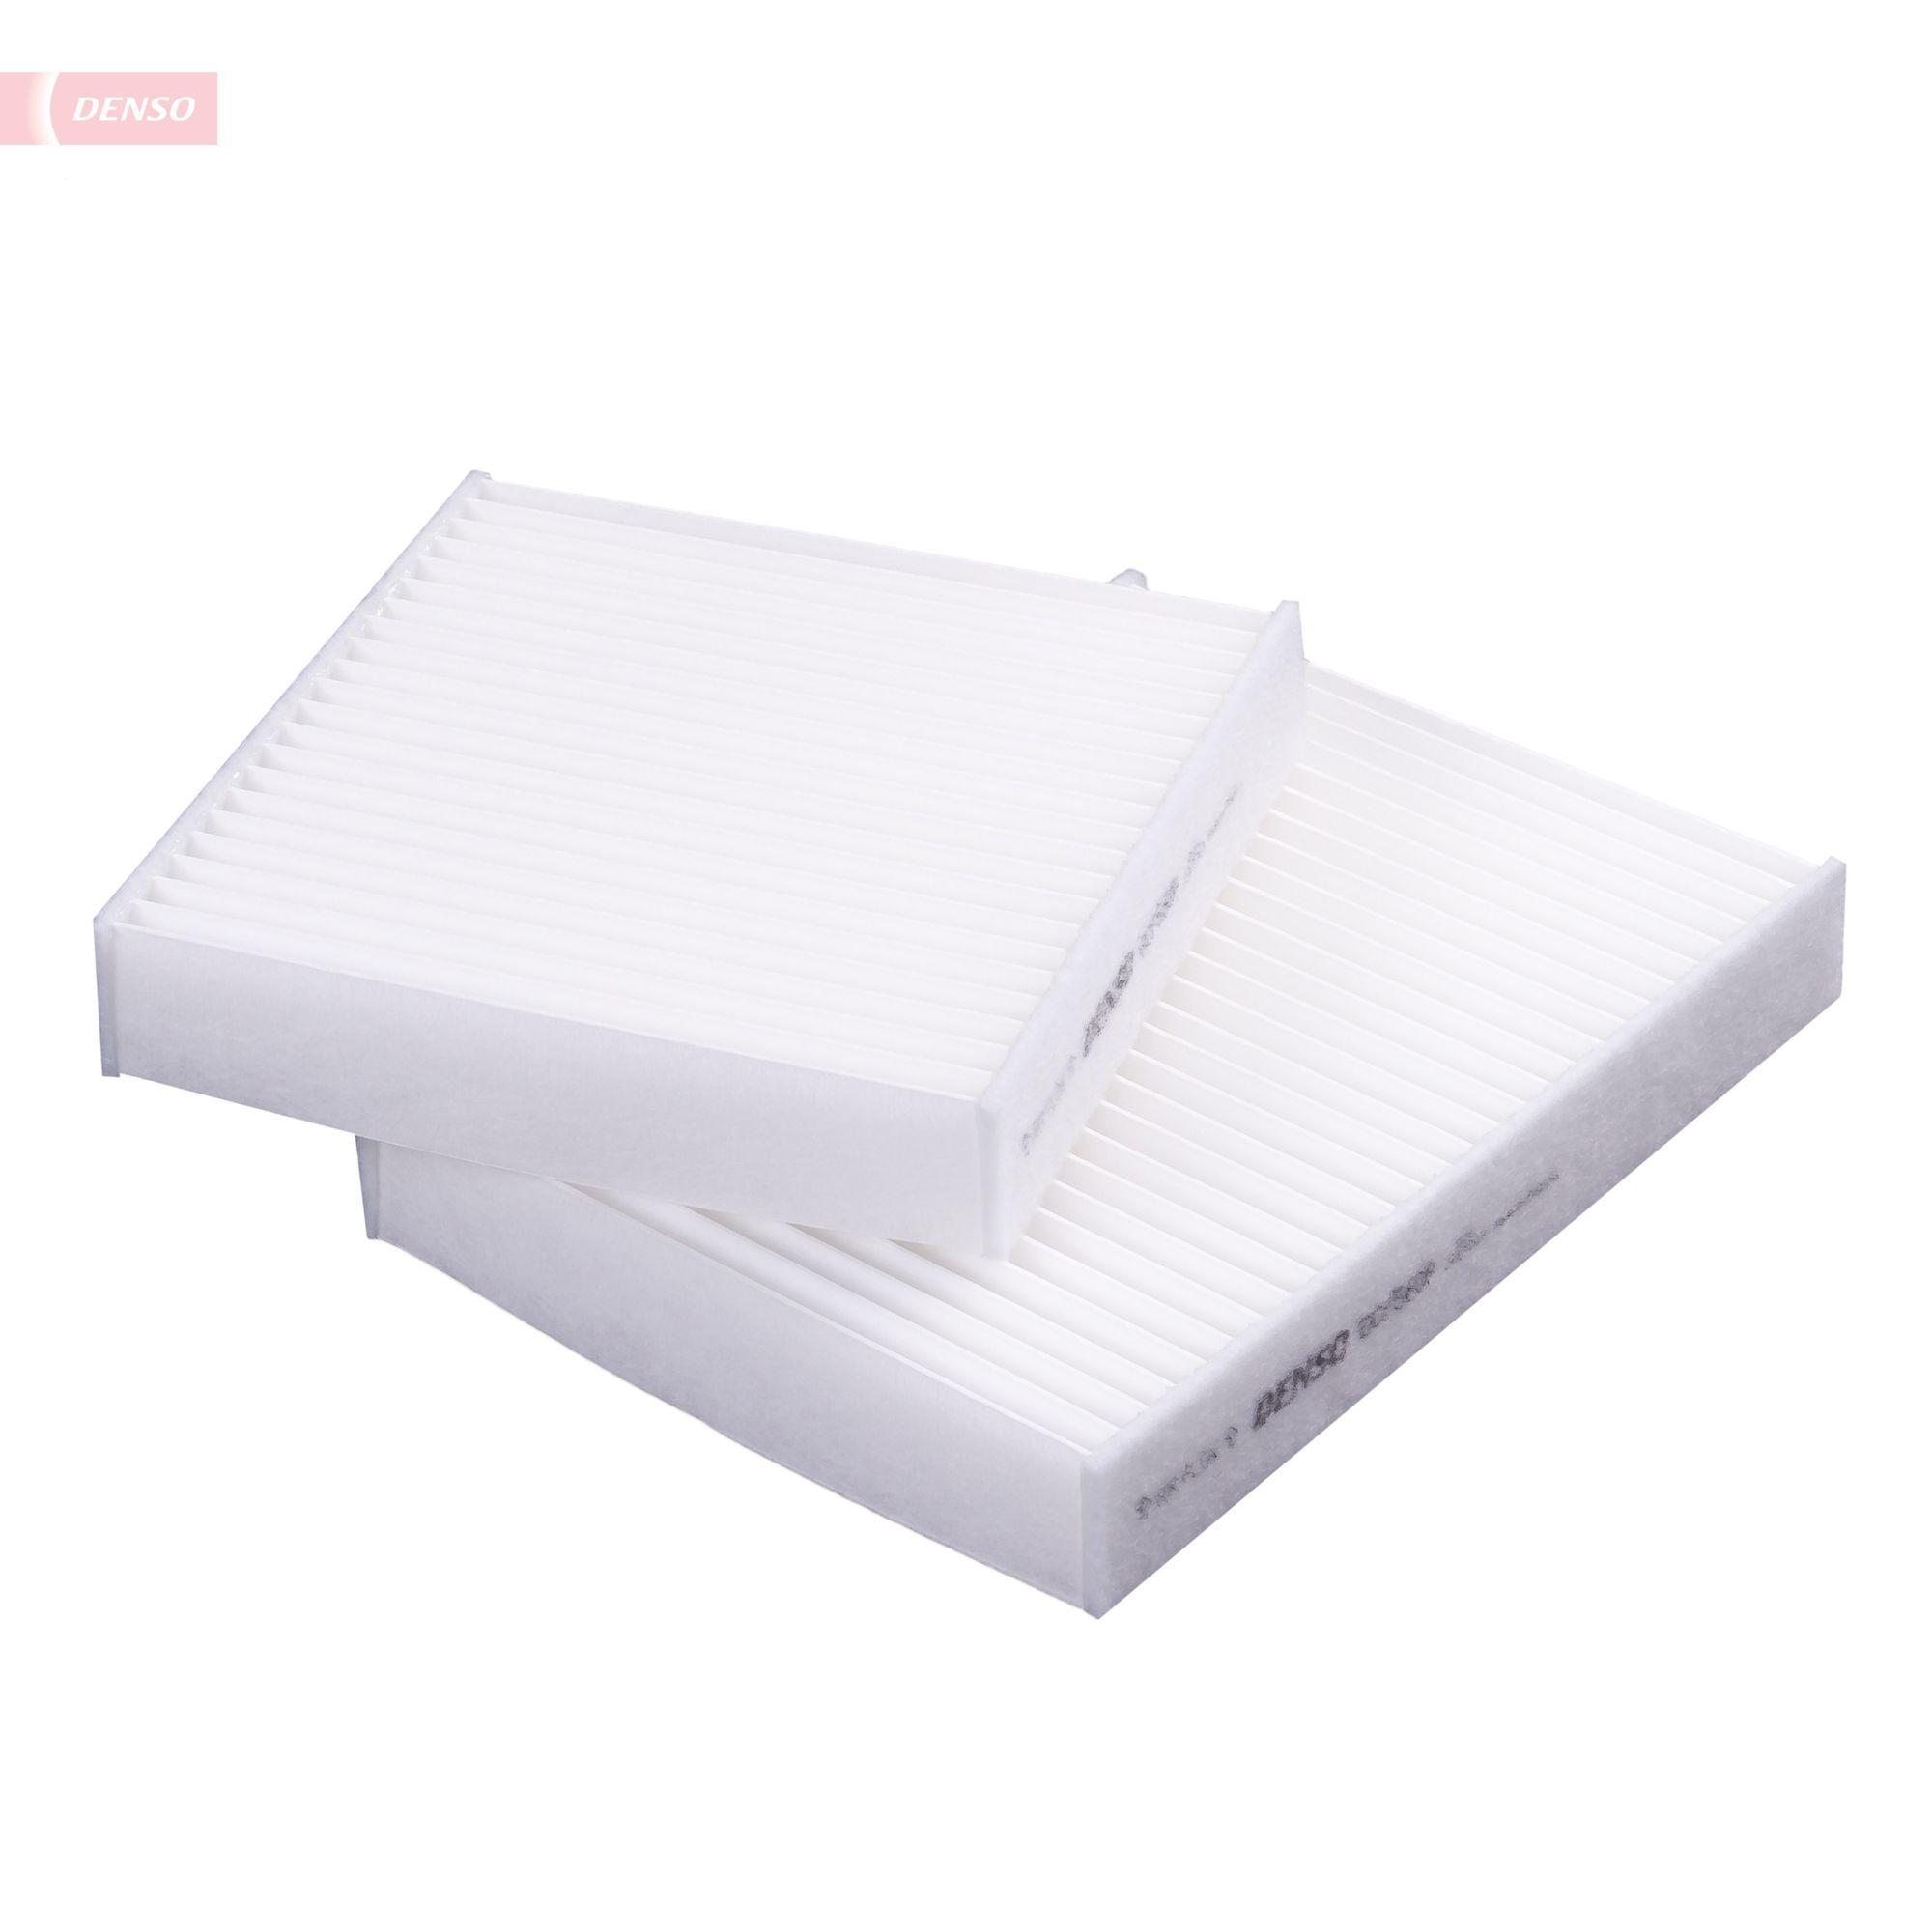 Staubfilter DENSO DCF560P Erfahrung